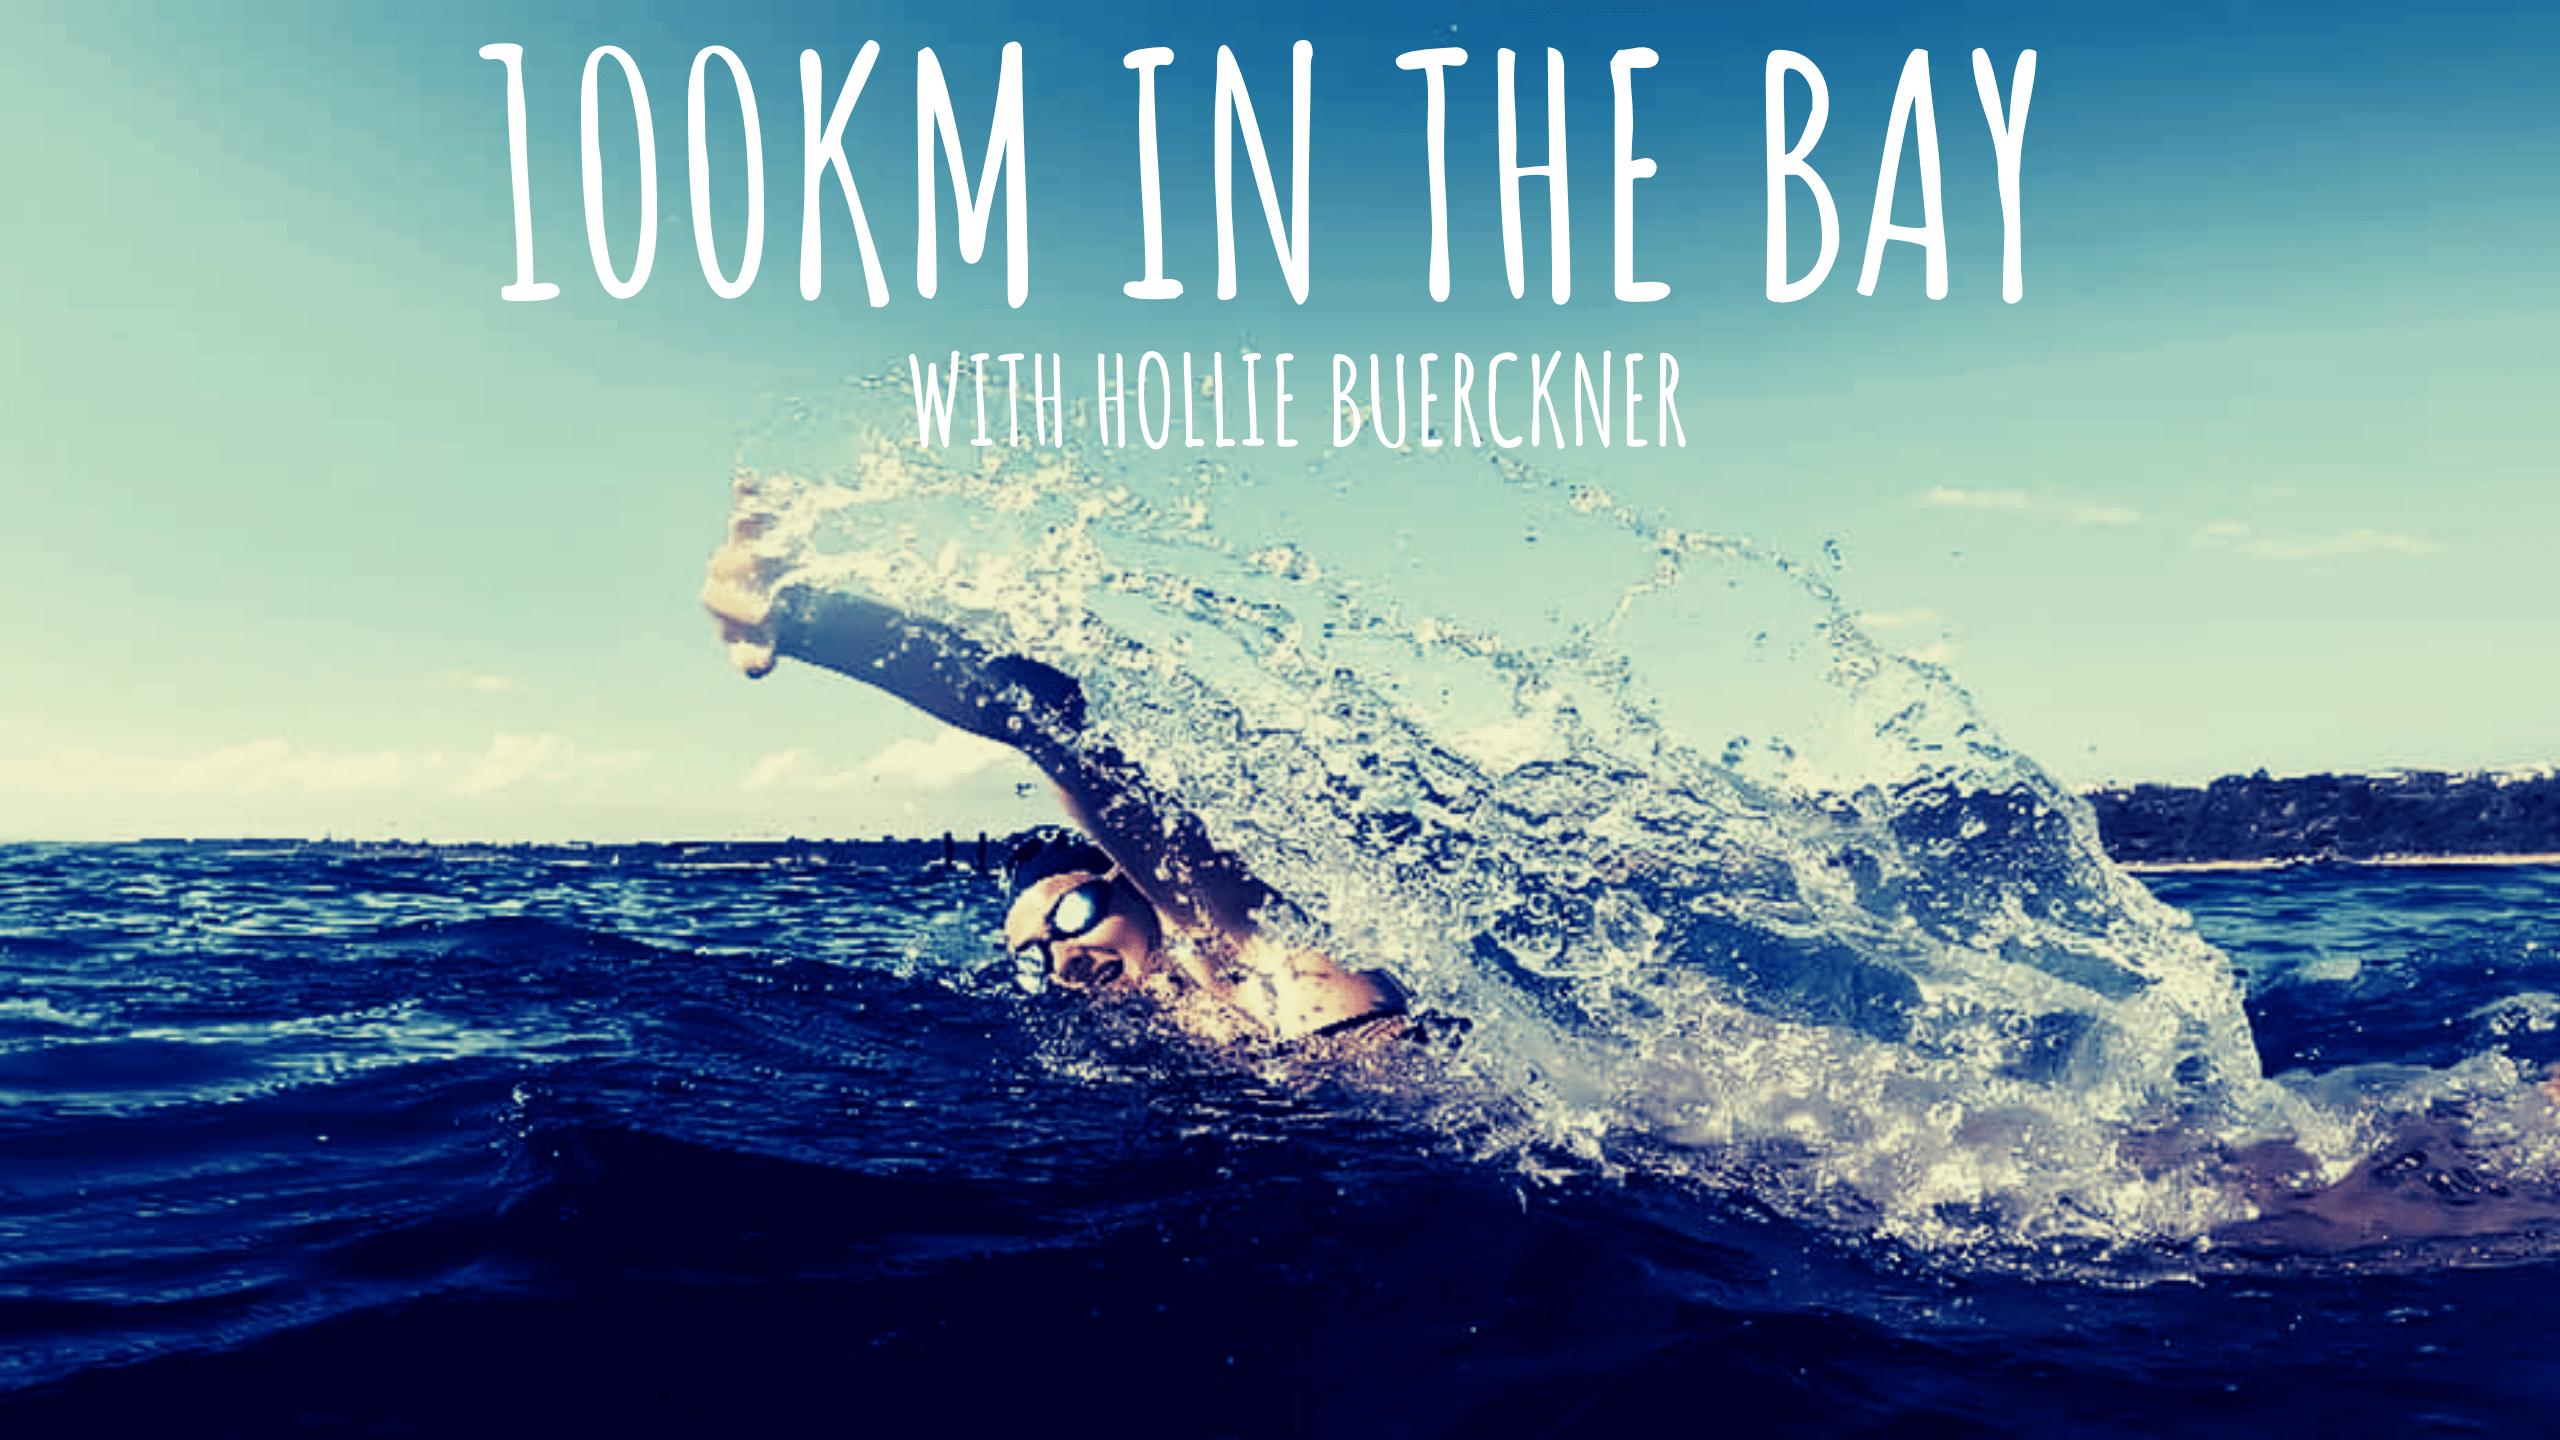 100km In The Bay with Hollie Buerckner